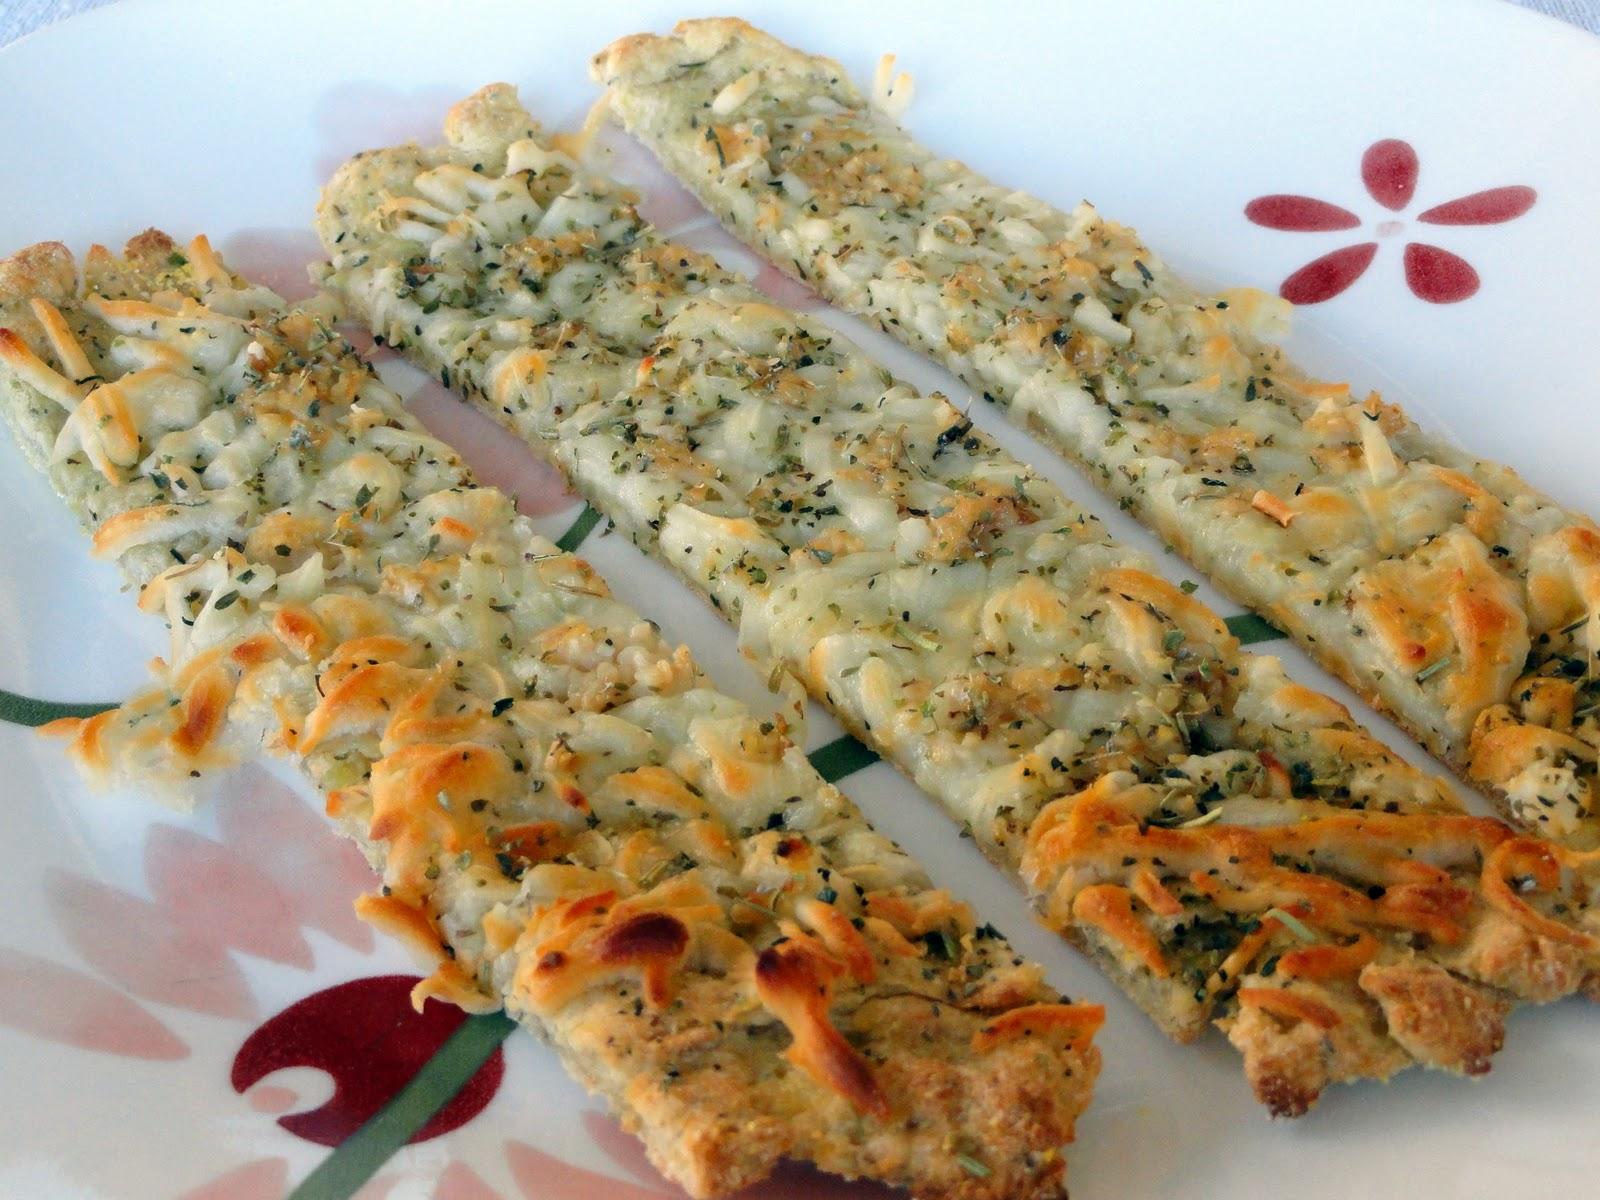 As Good As Gluten: Garlic Cheese Breadsticks